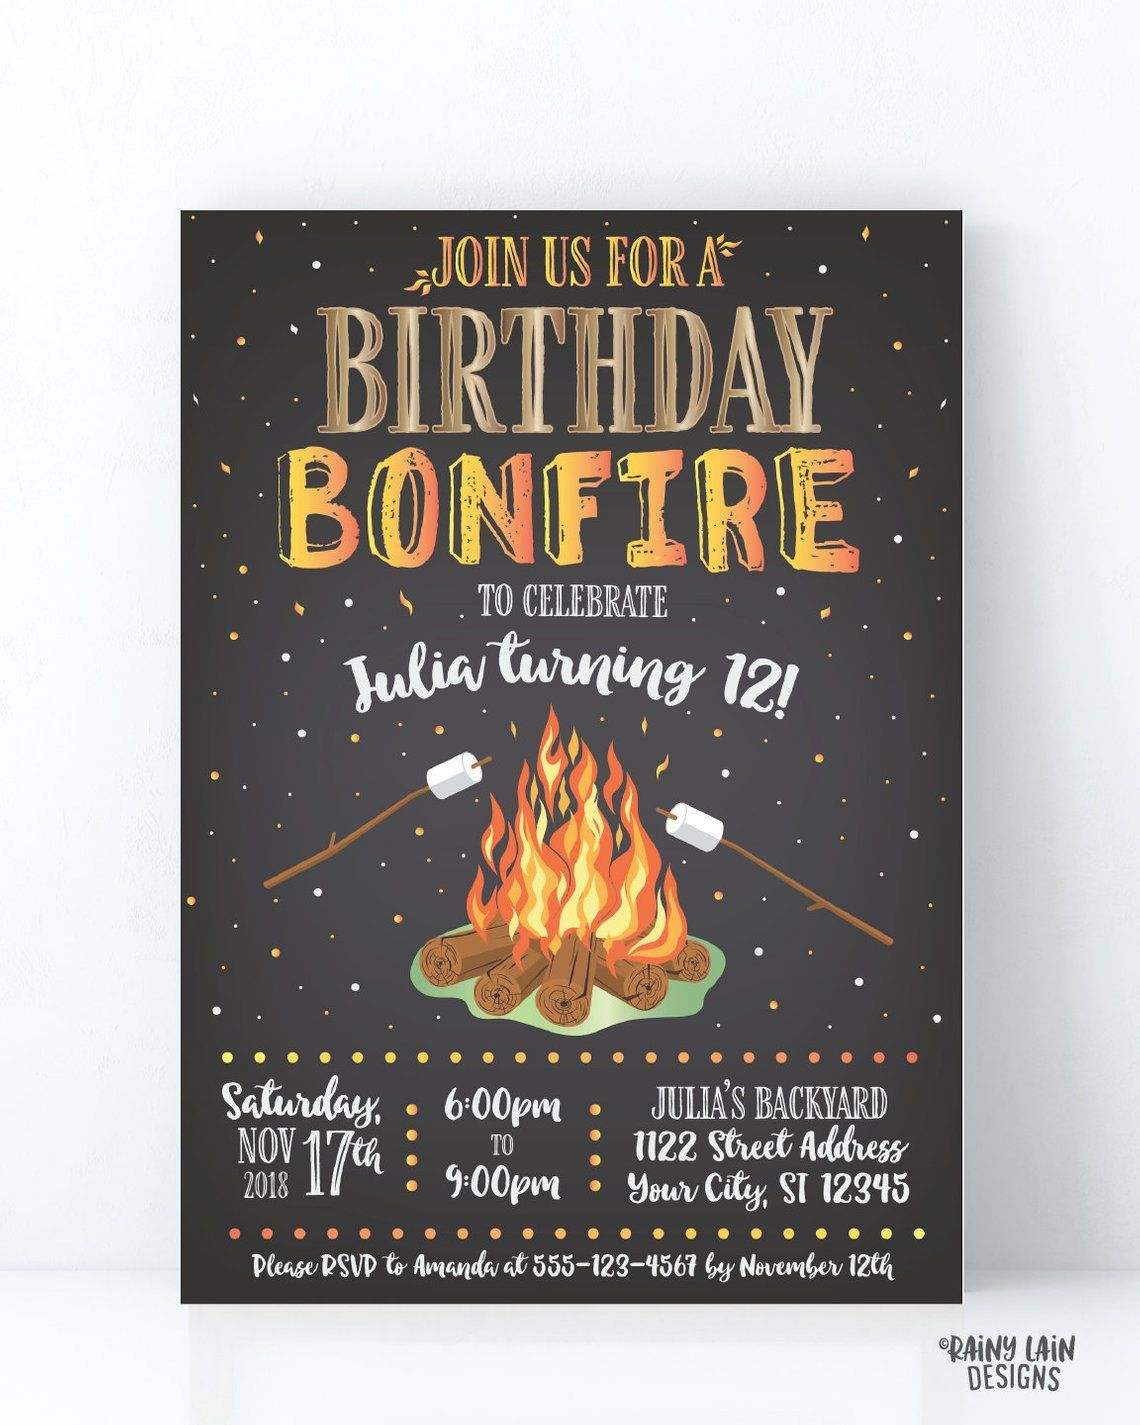 Bonfire Birthday Invitation Backyard Invite Smores